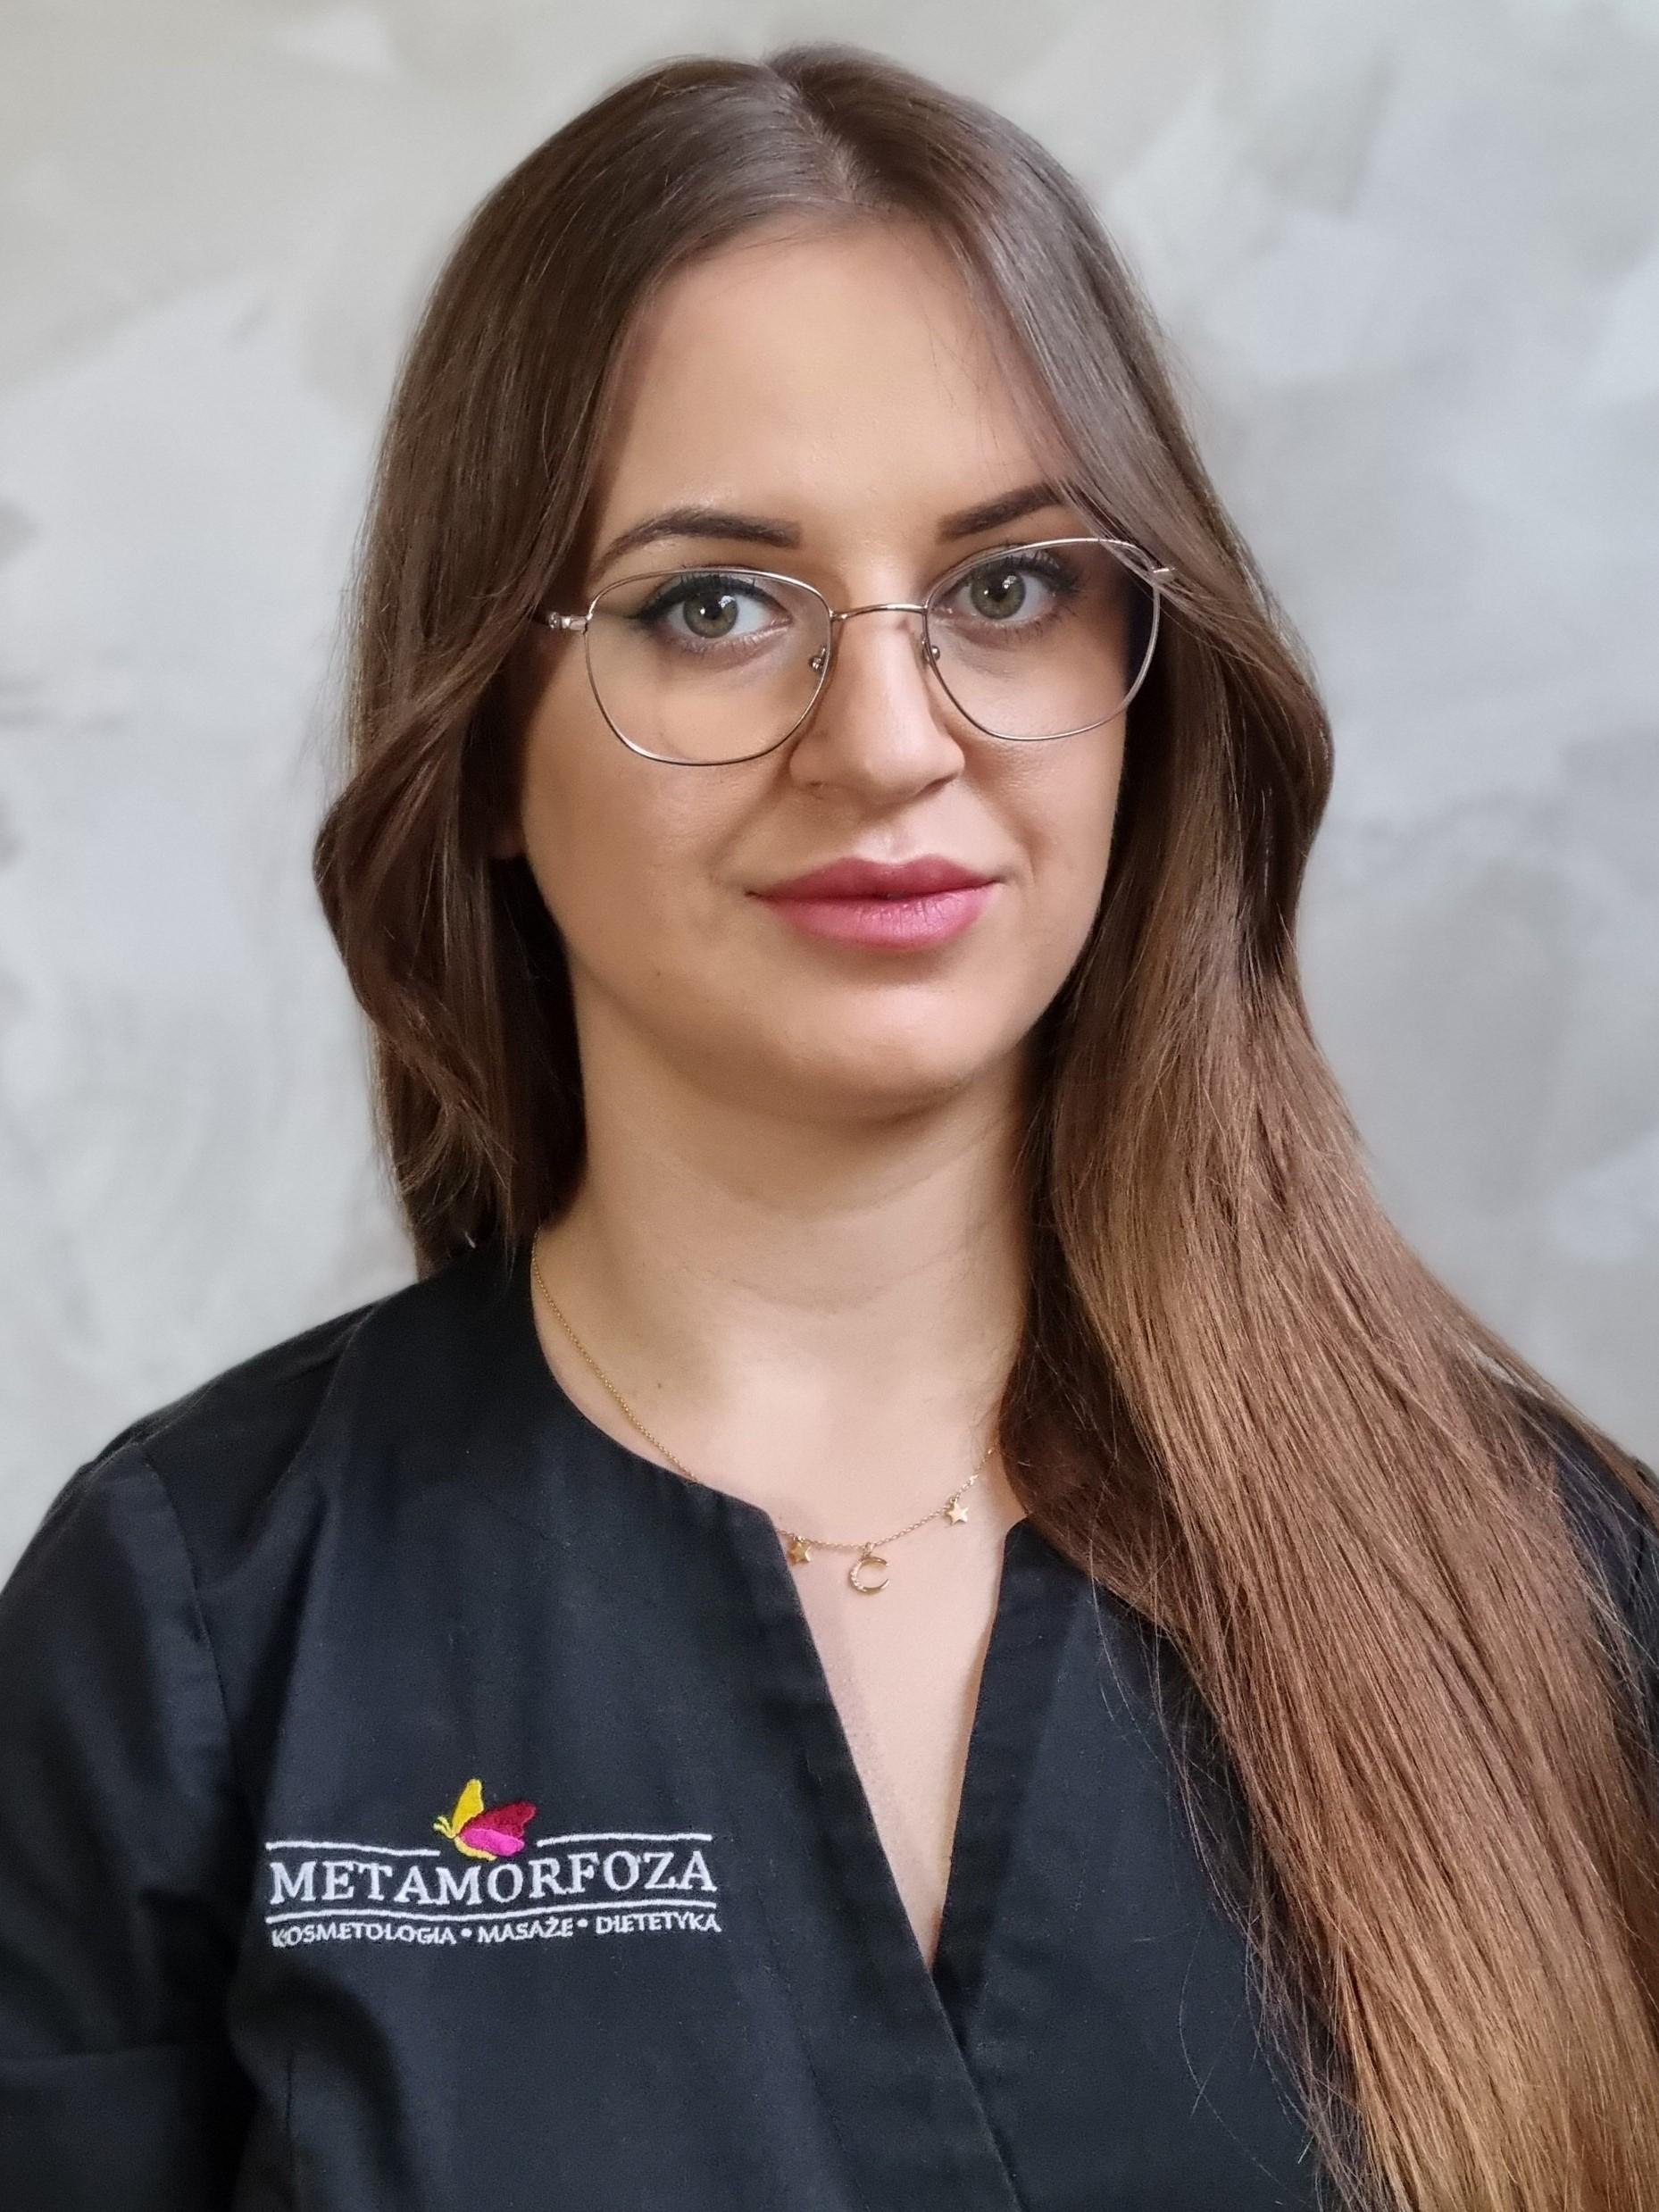 Kosmetolog Weronika Gwiazdowska